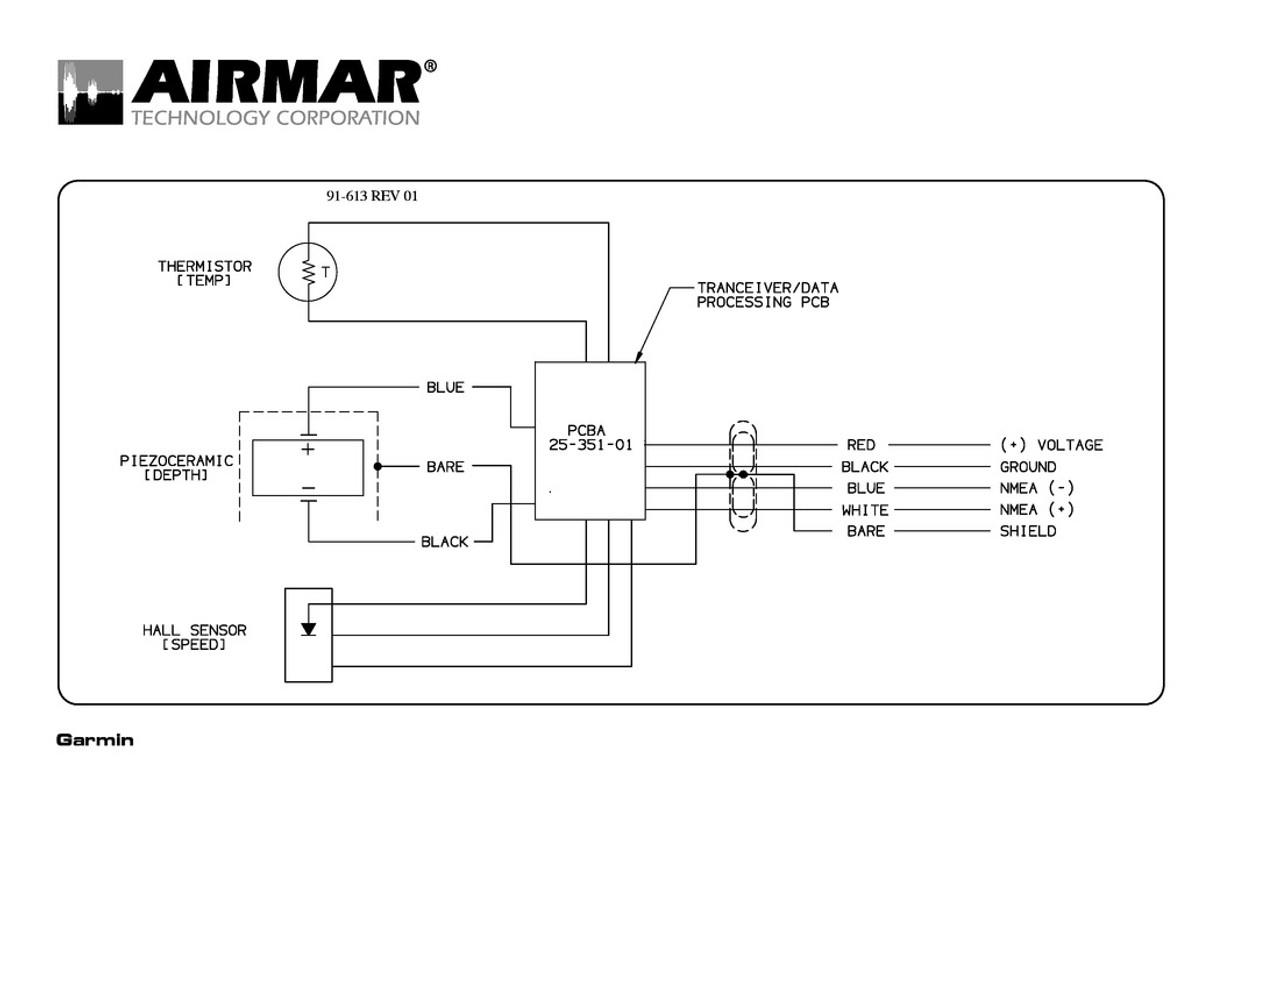 Garmin Usb Wiring Diagram - Diagrams Catalogue on